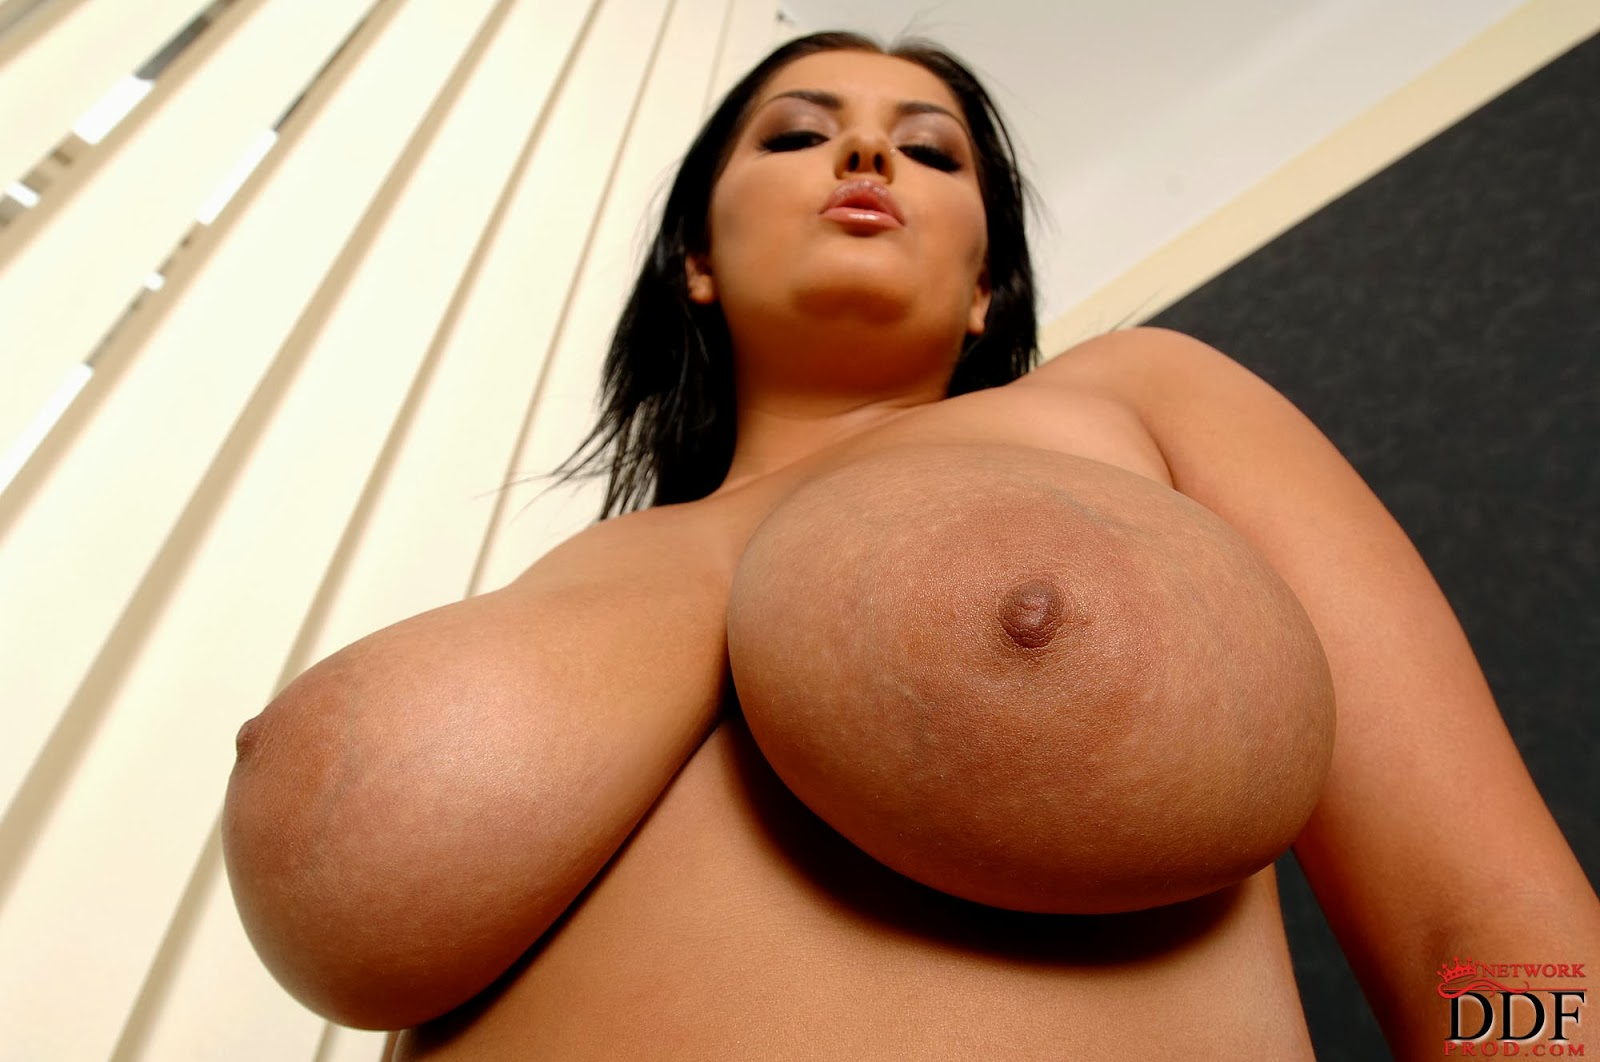 Firm Natural Big Boobs Escort Jasmin Sexy Body